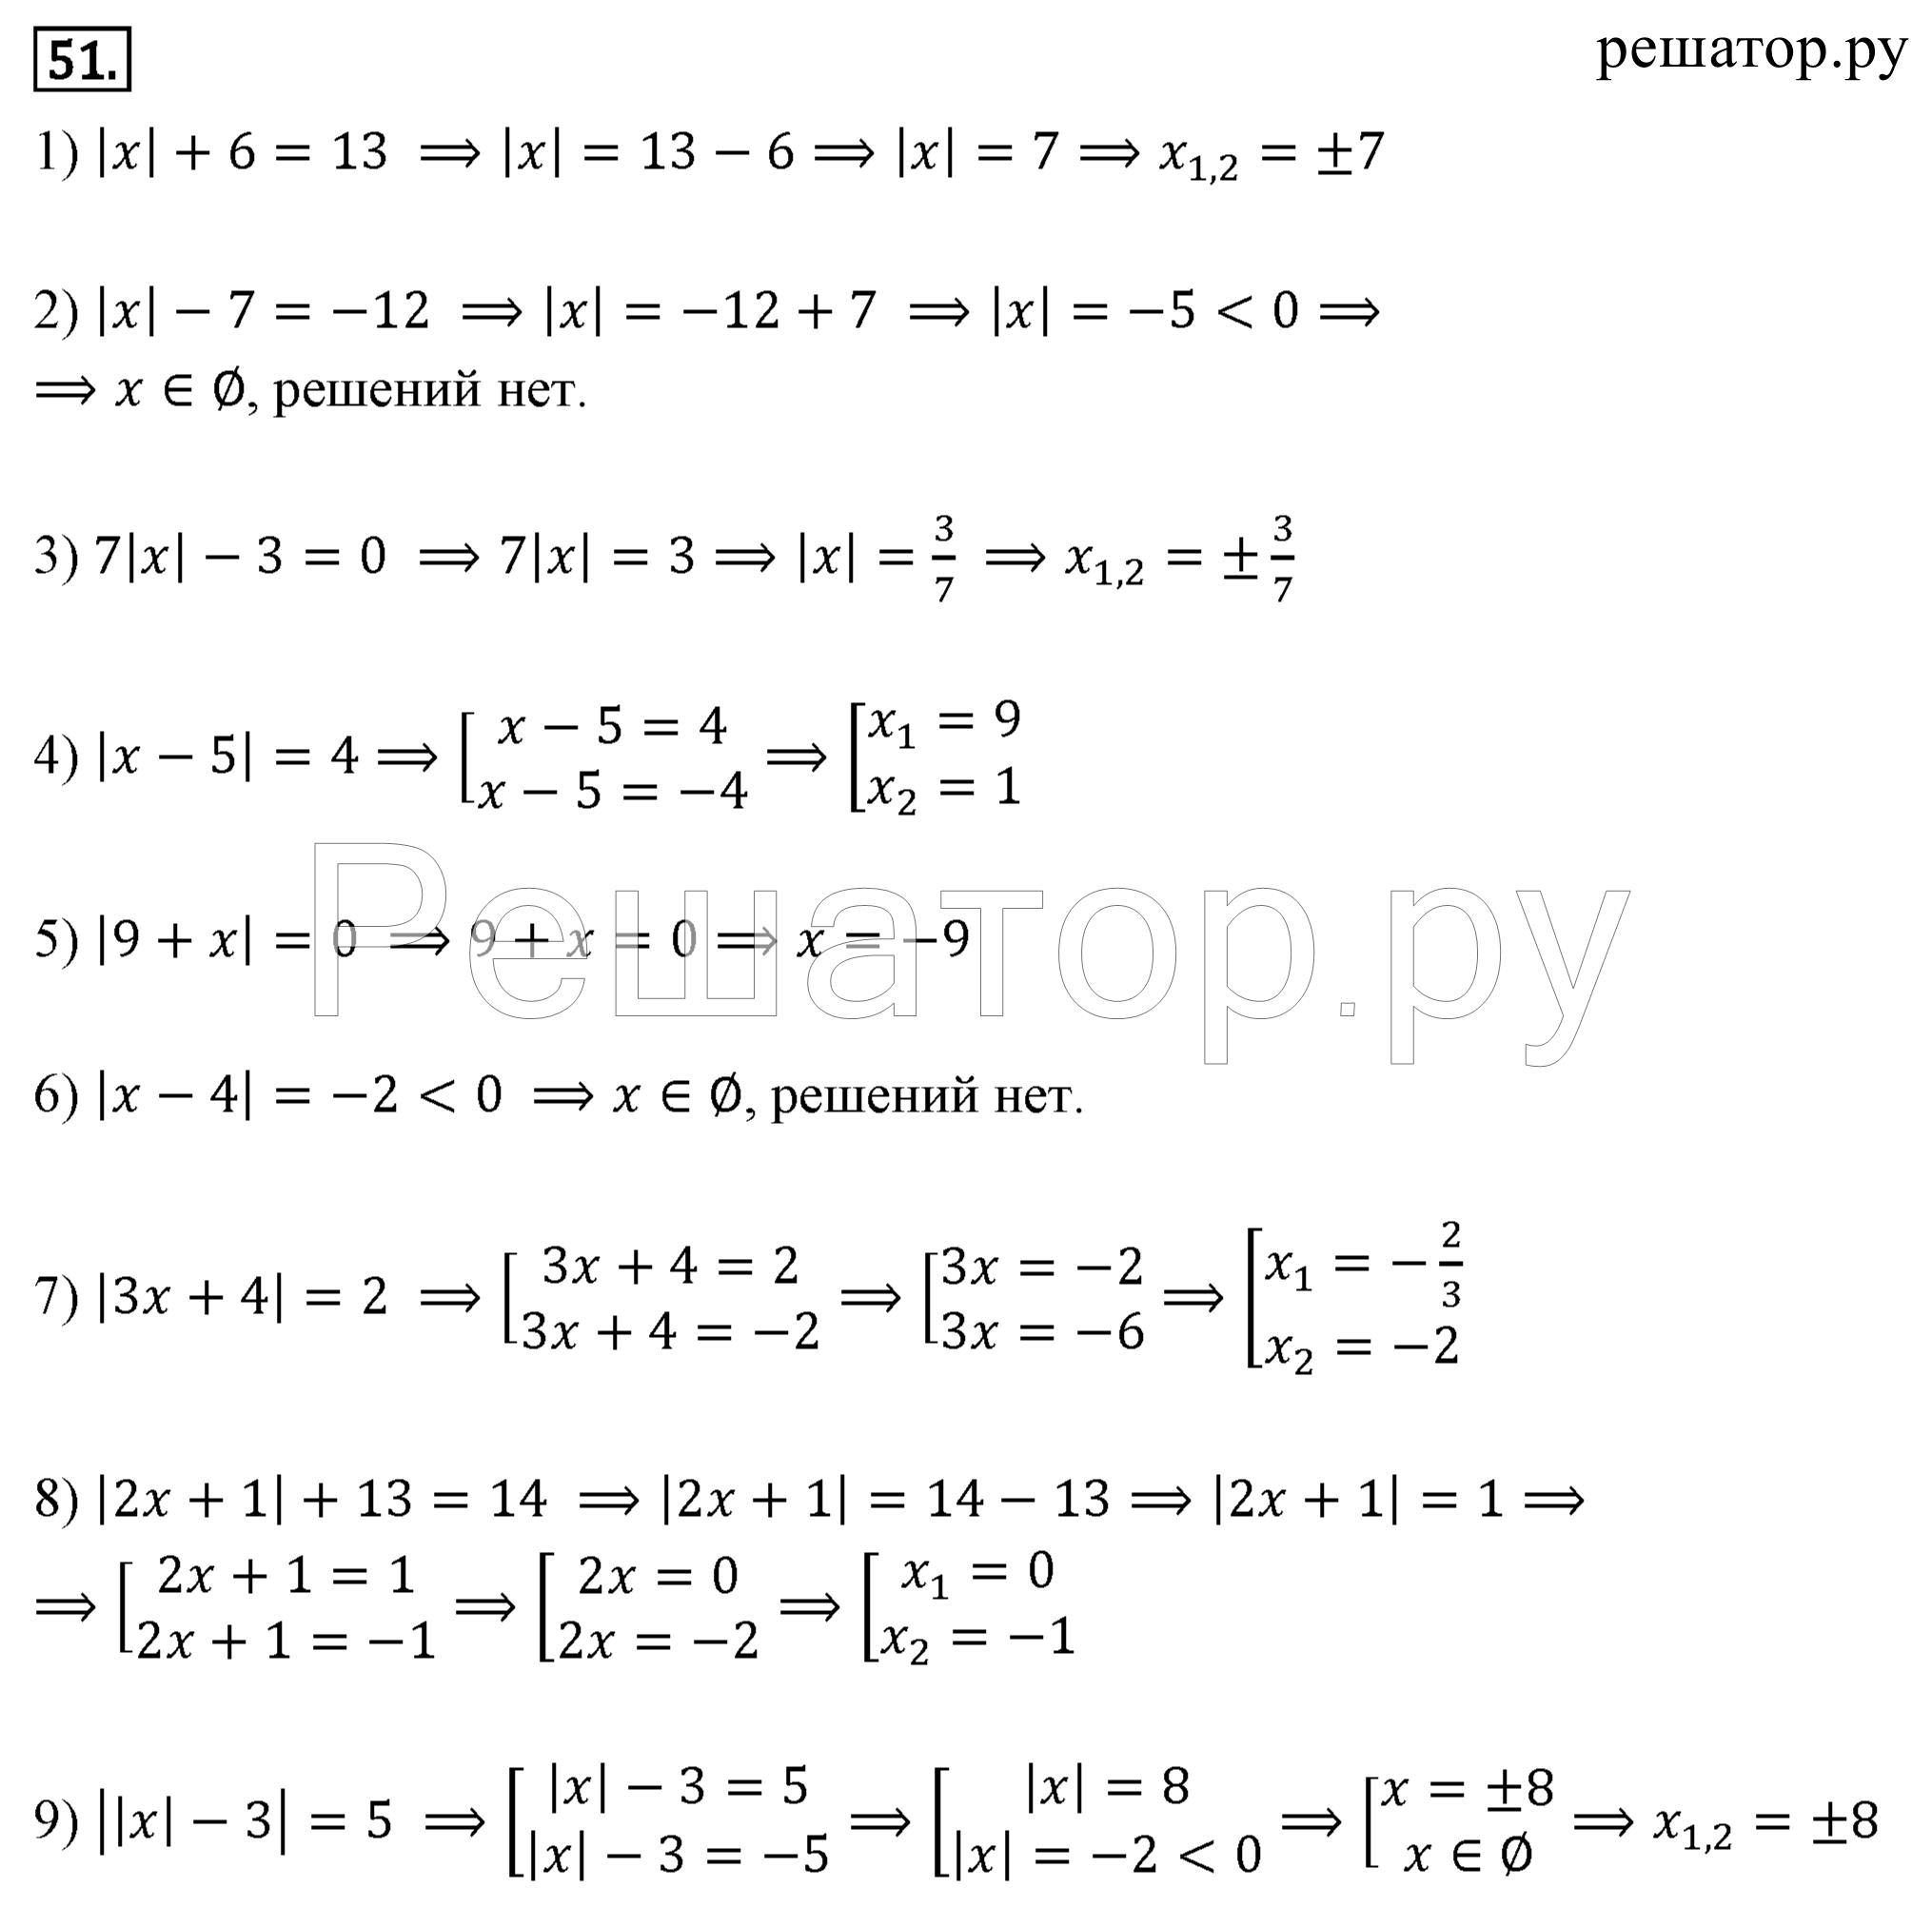 гдз по математике мерзляк 2019 год